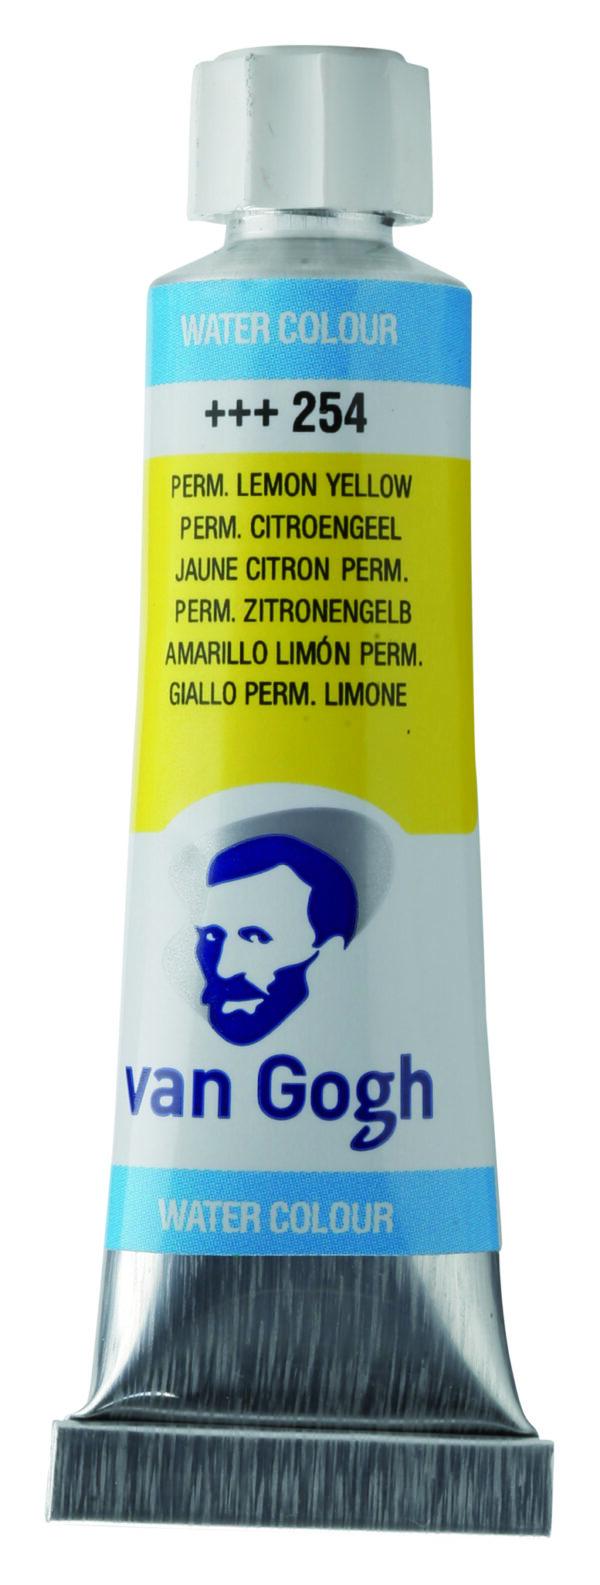 Van Gogh 254 Permanent lemon yellow - 10 ml